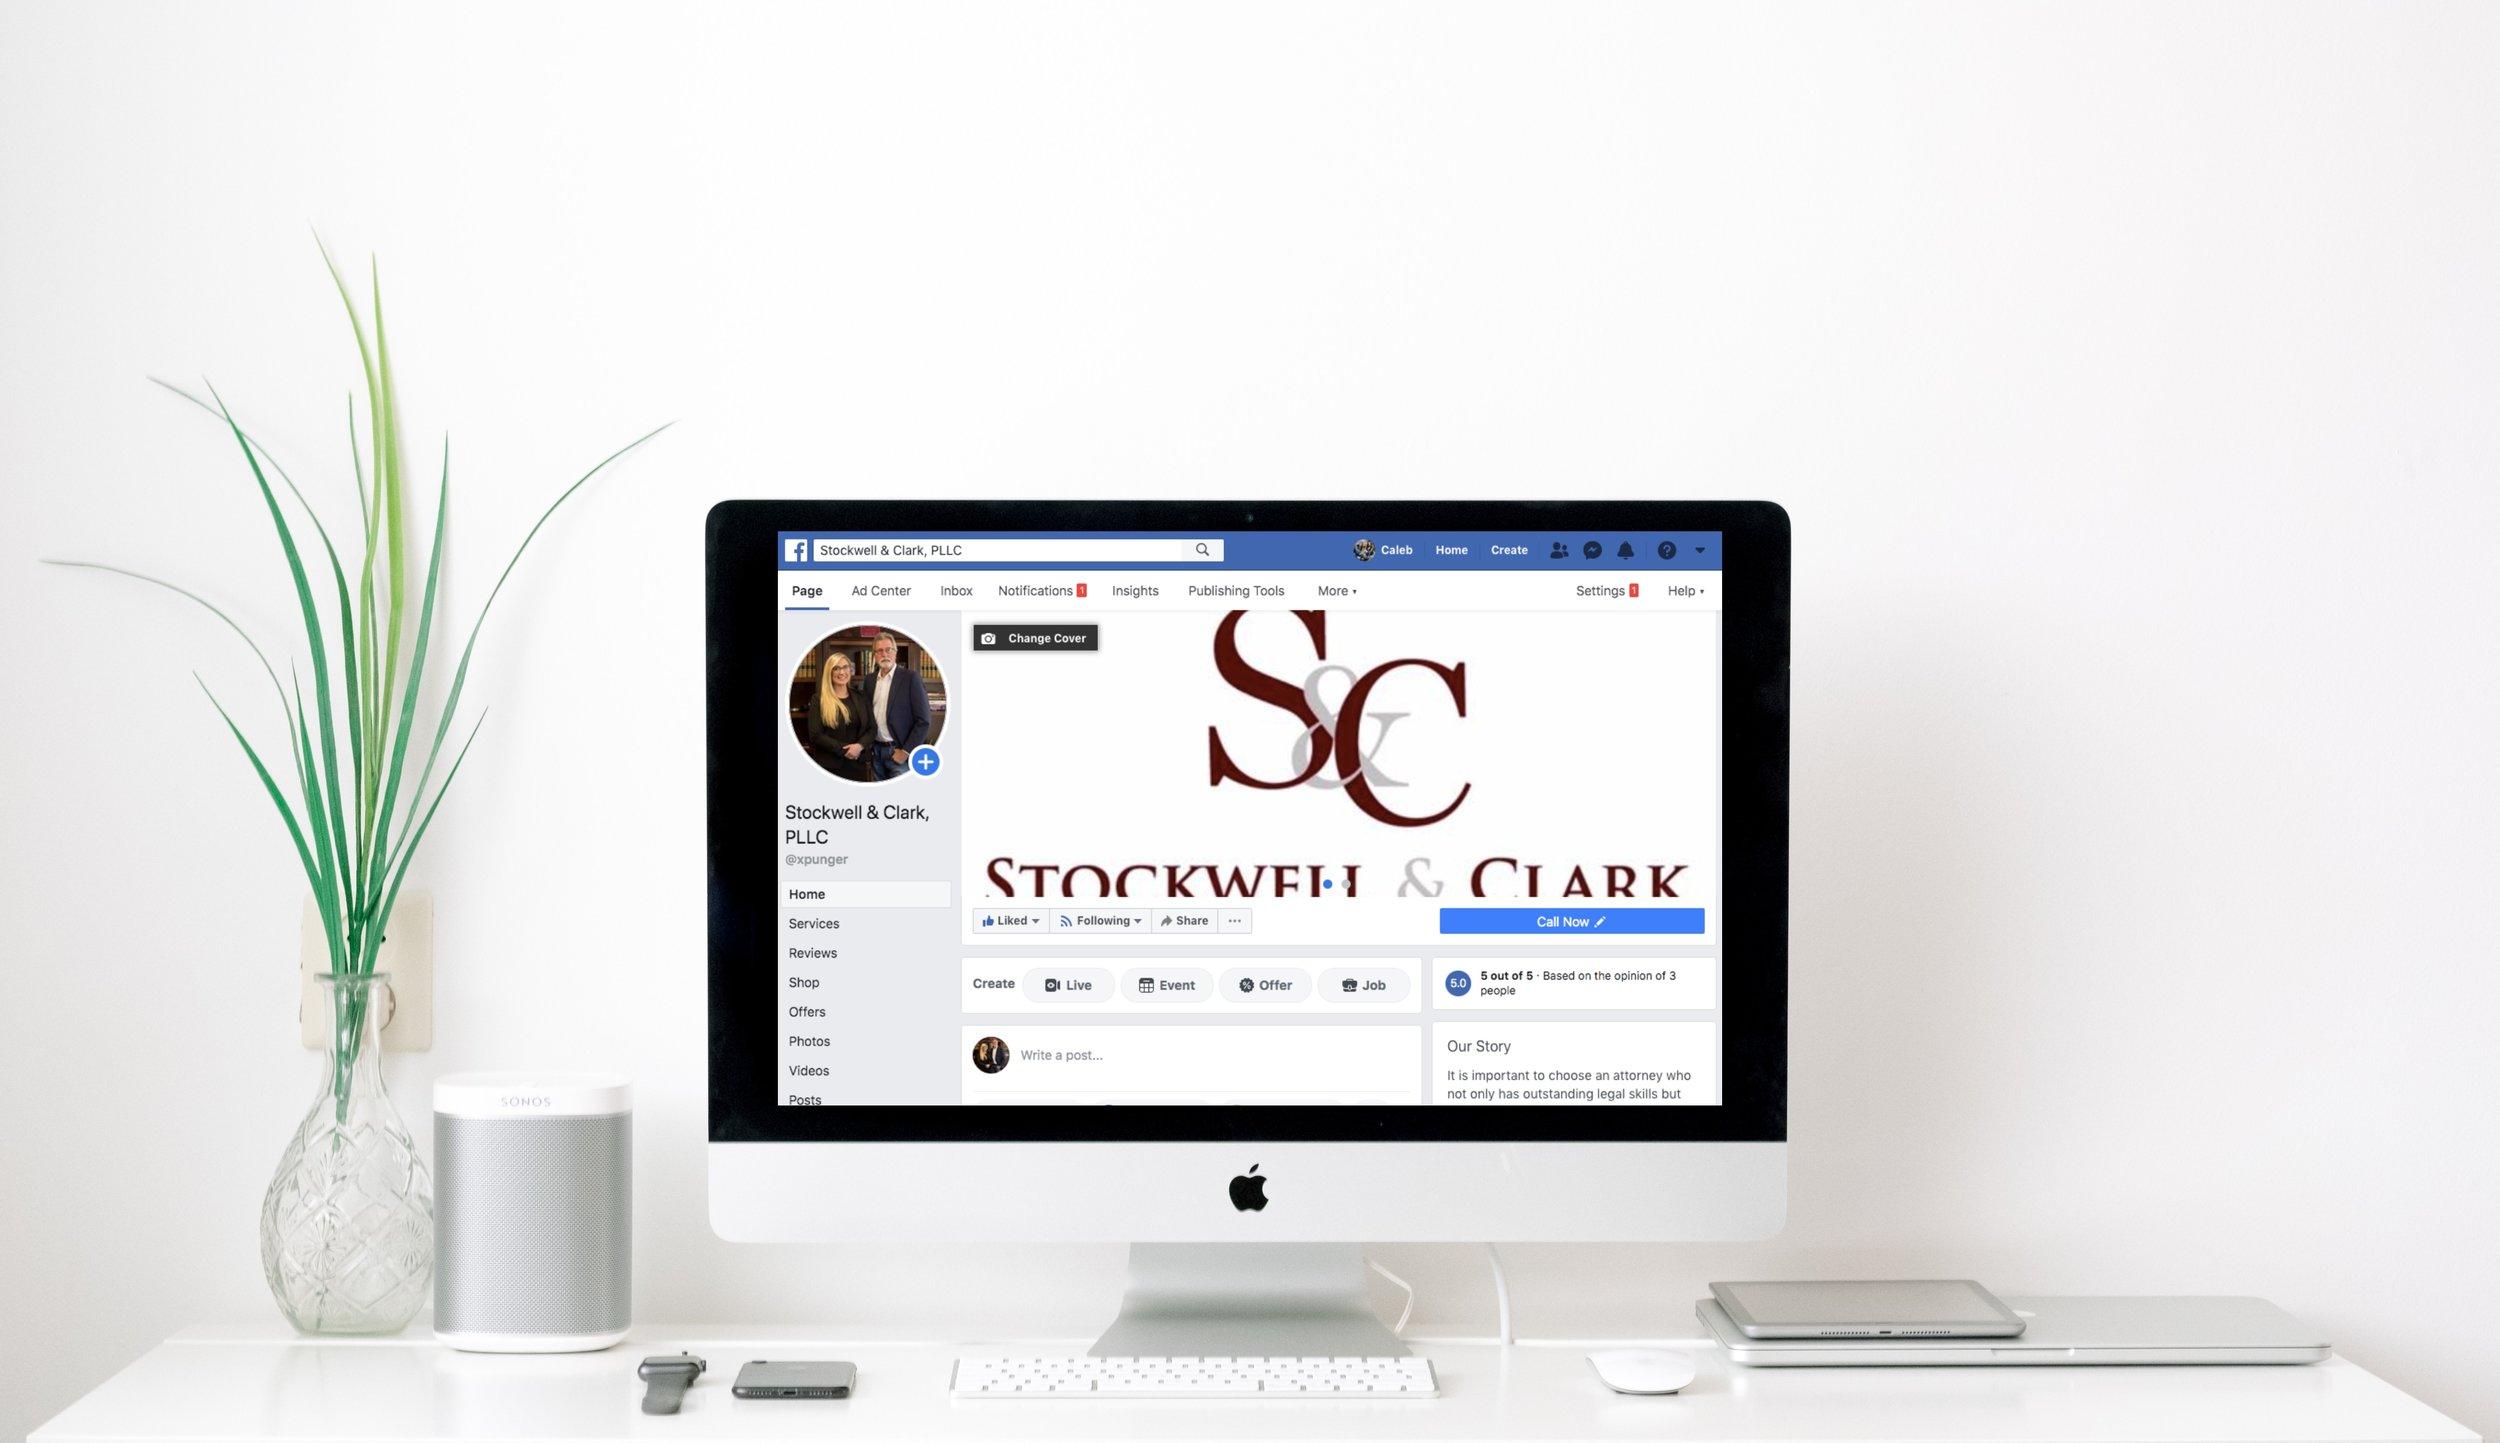 Stockwell & Clark Marketing Piece.jpg